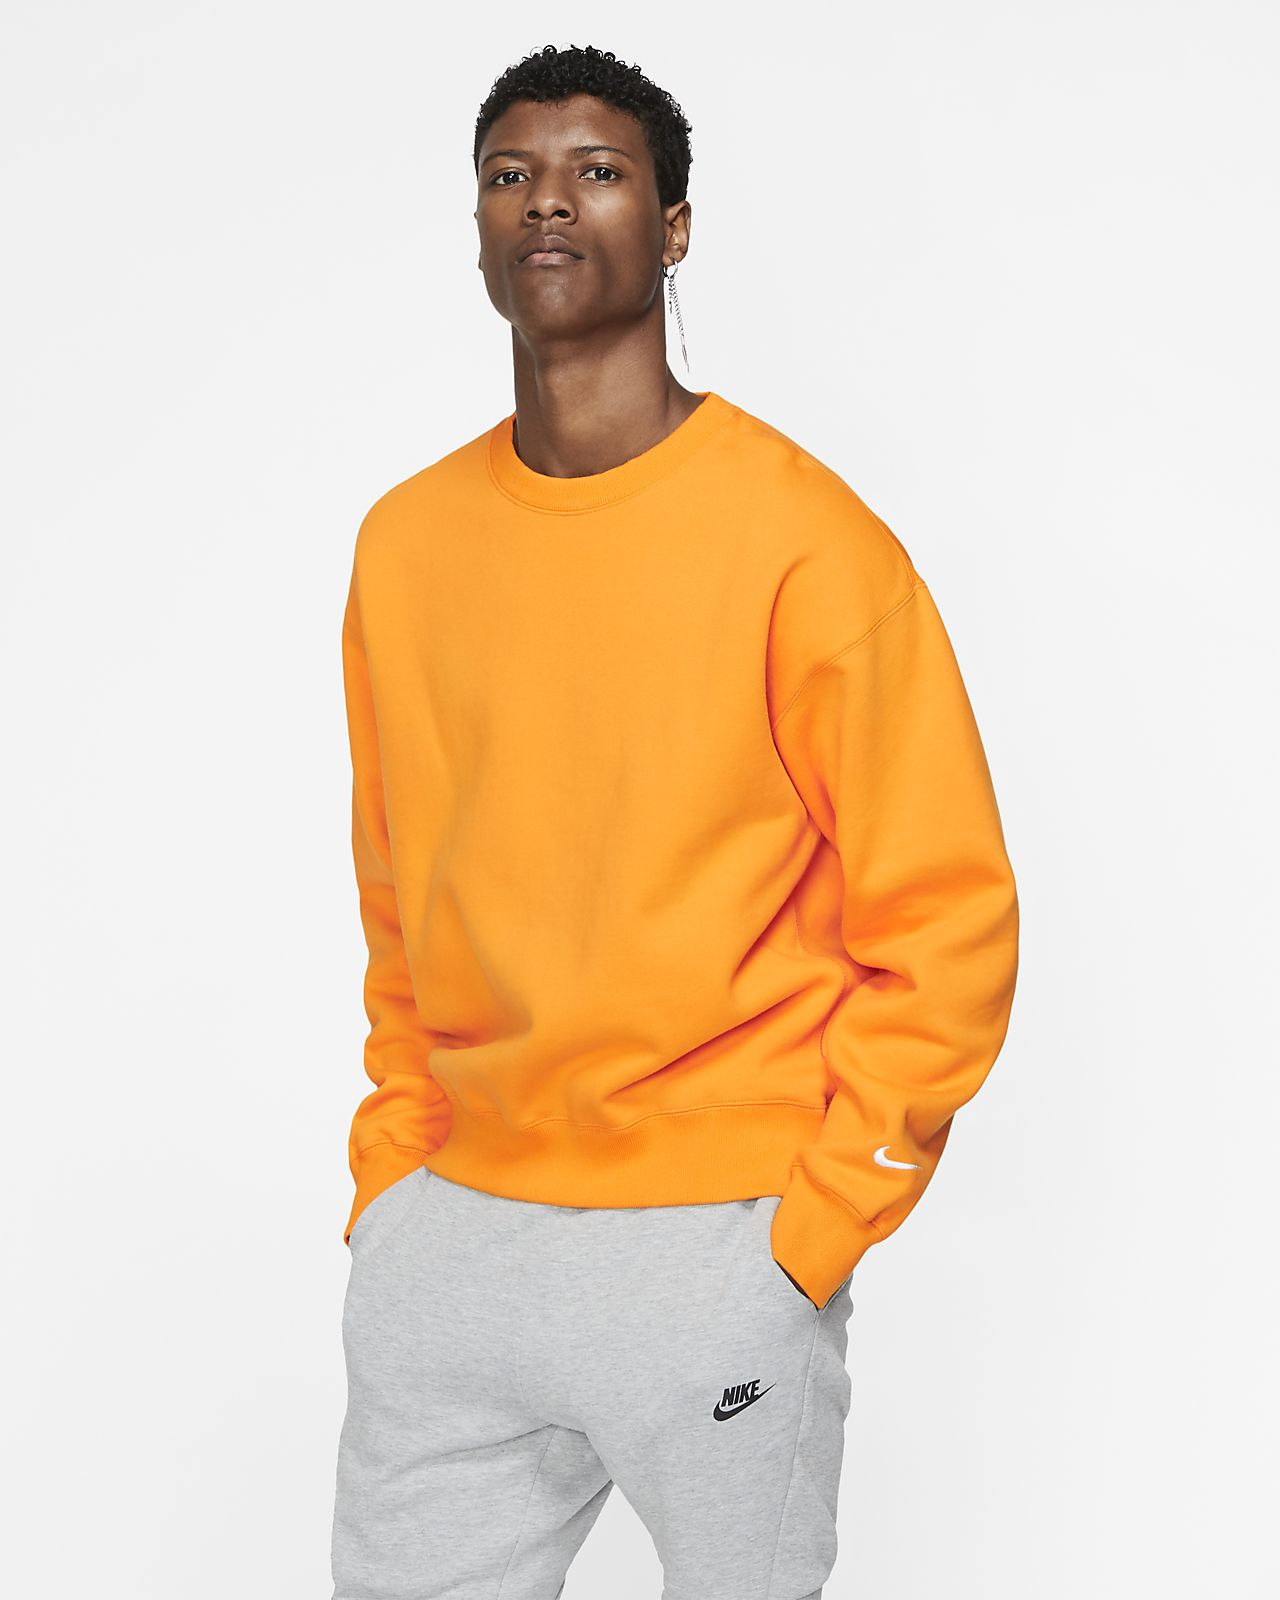 NikeLab Collection rundhalset genser til herre